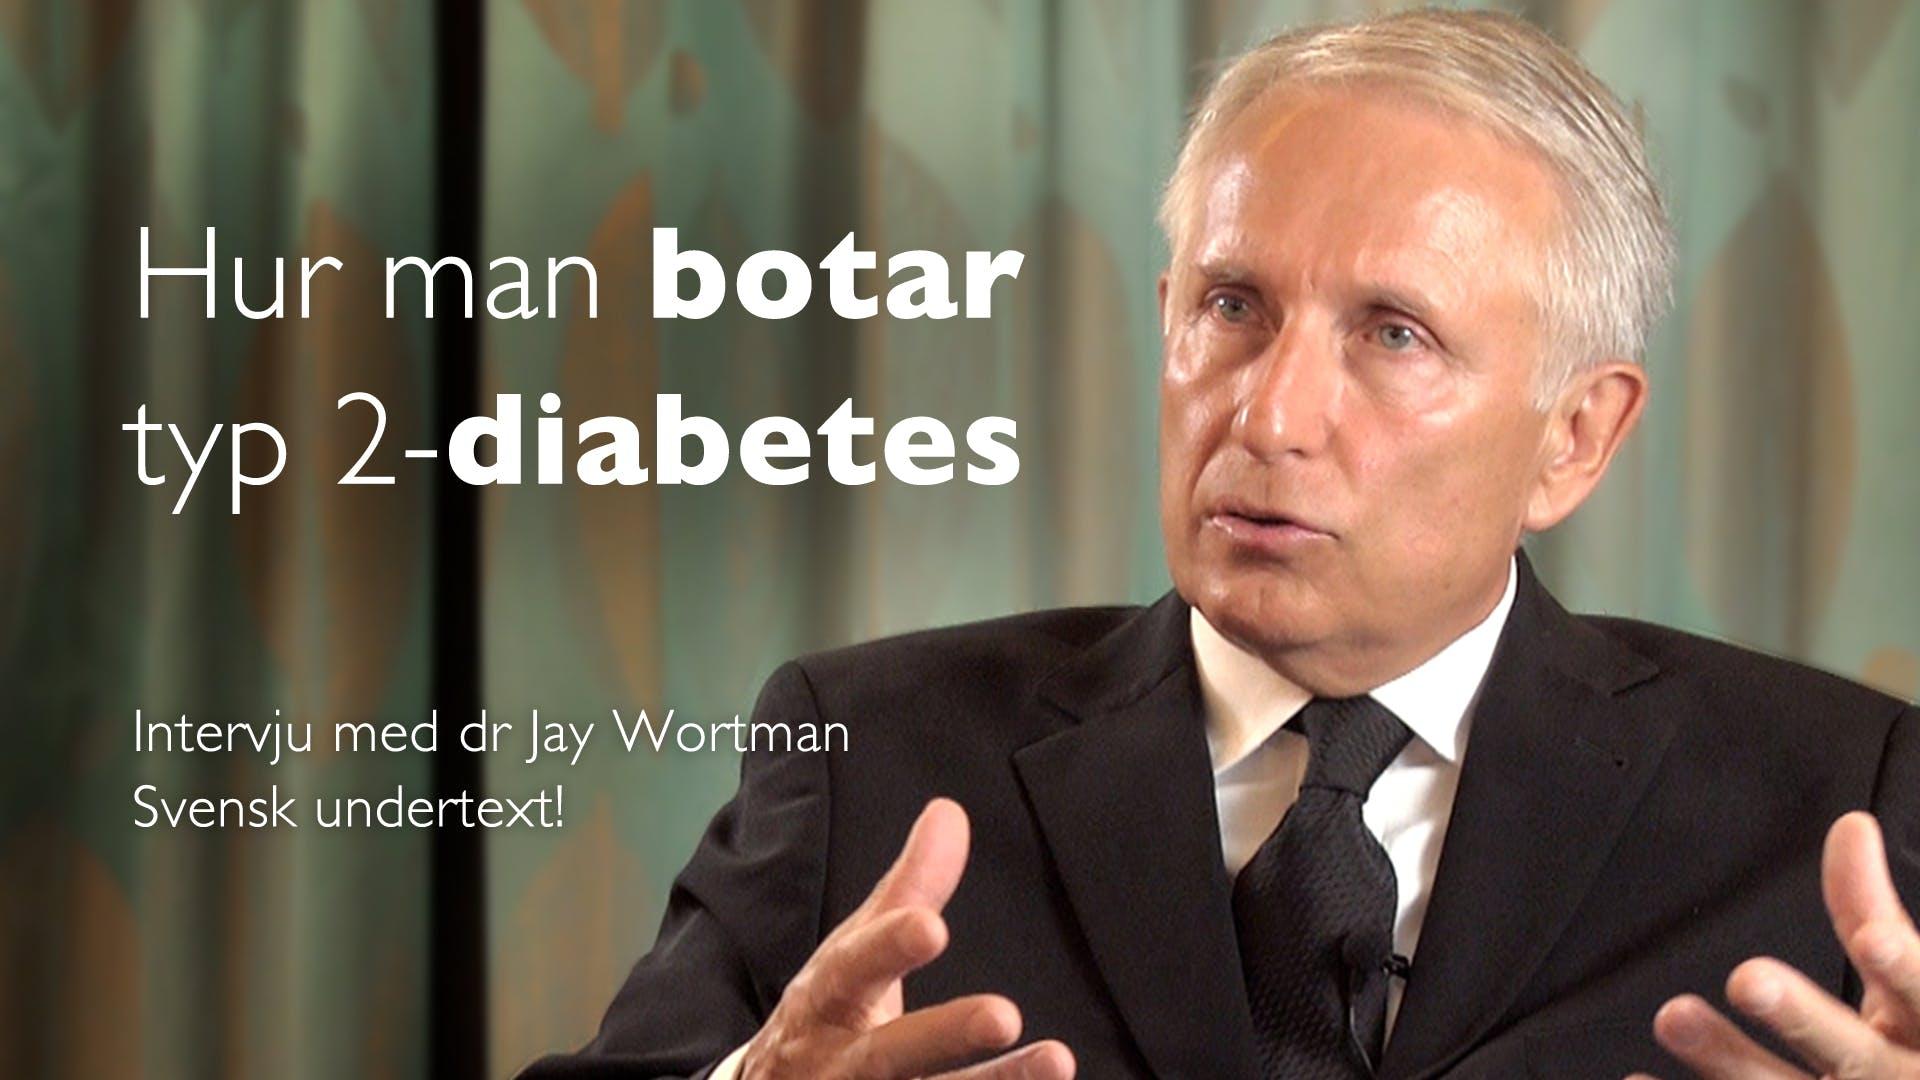 Wortman